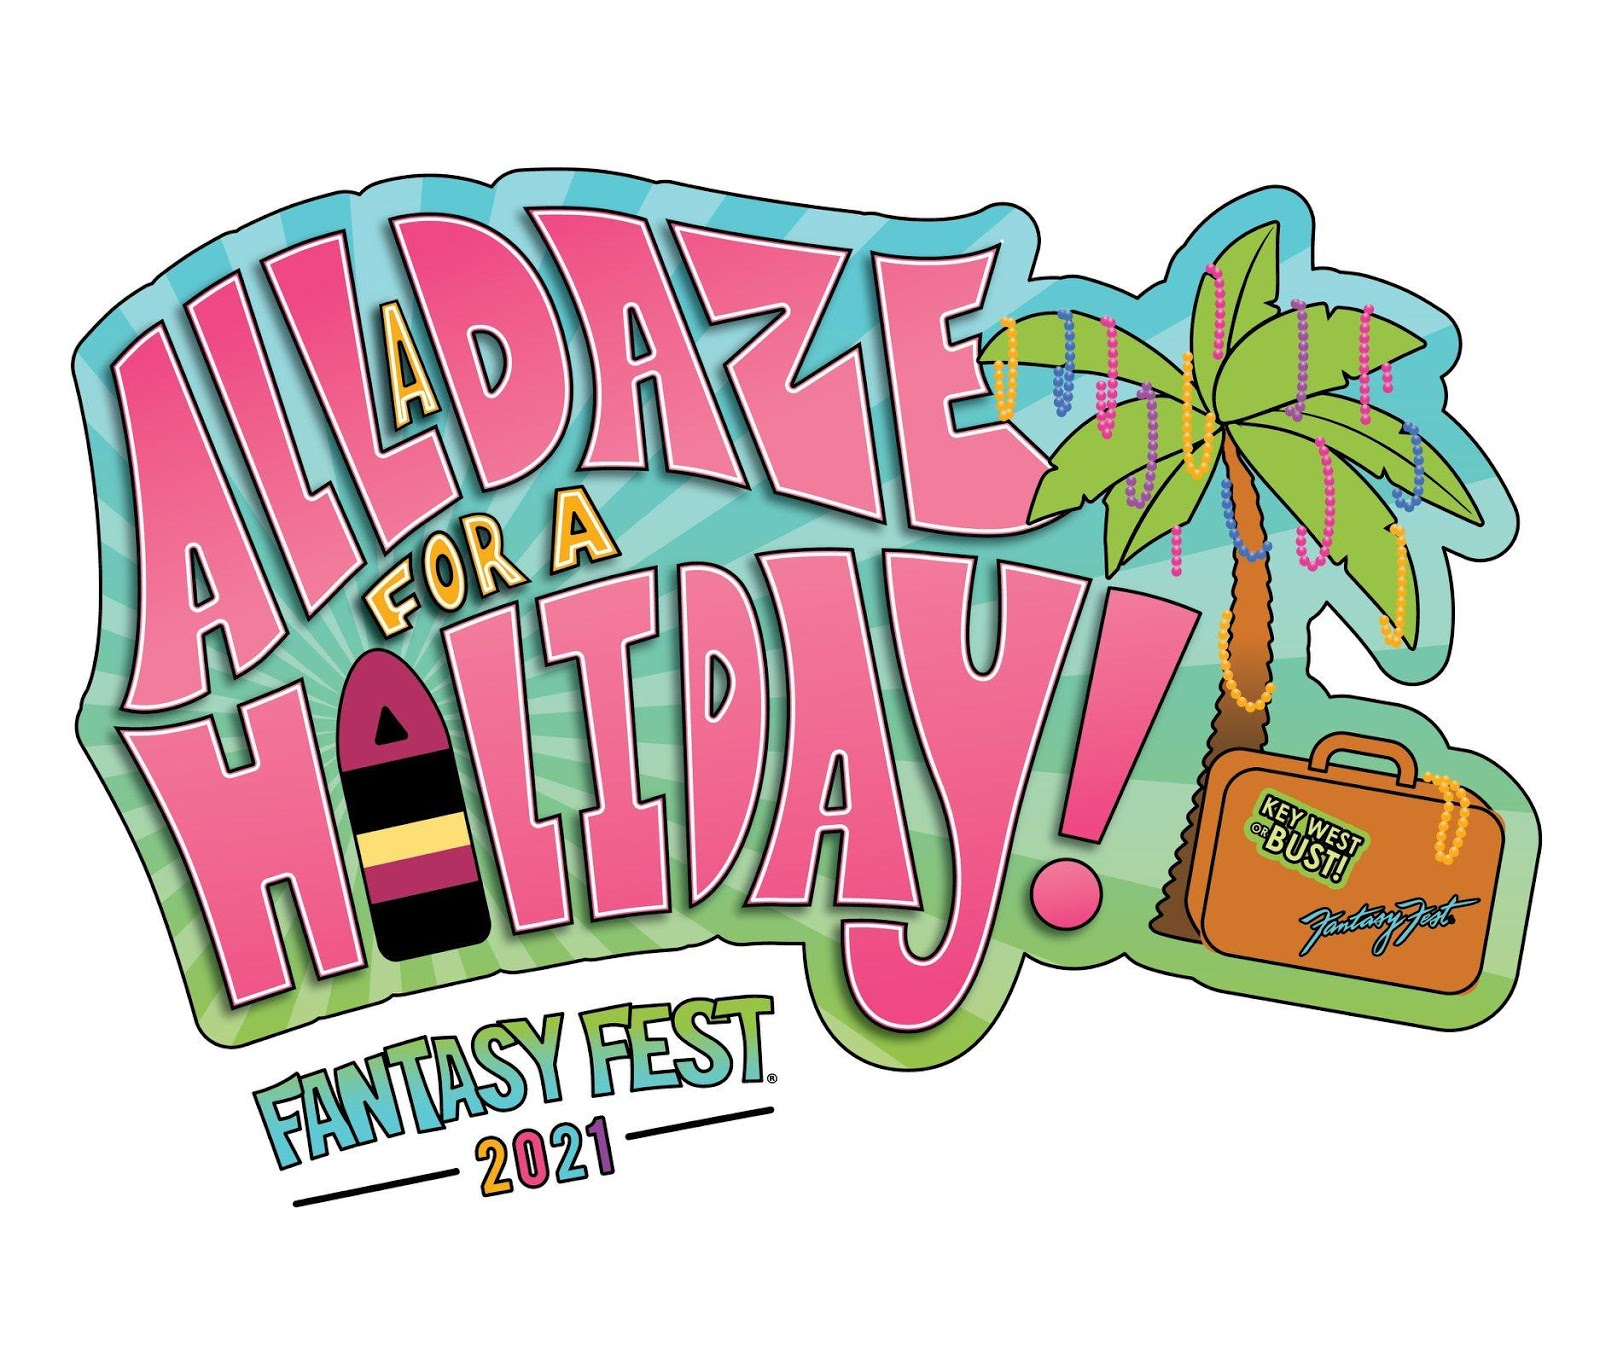 colorful Fantasy Fest logo